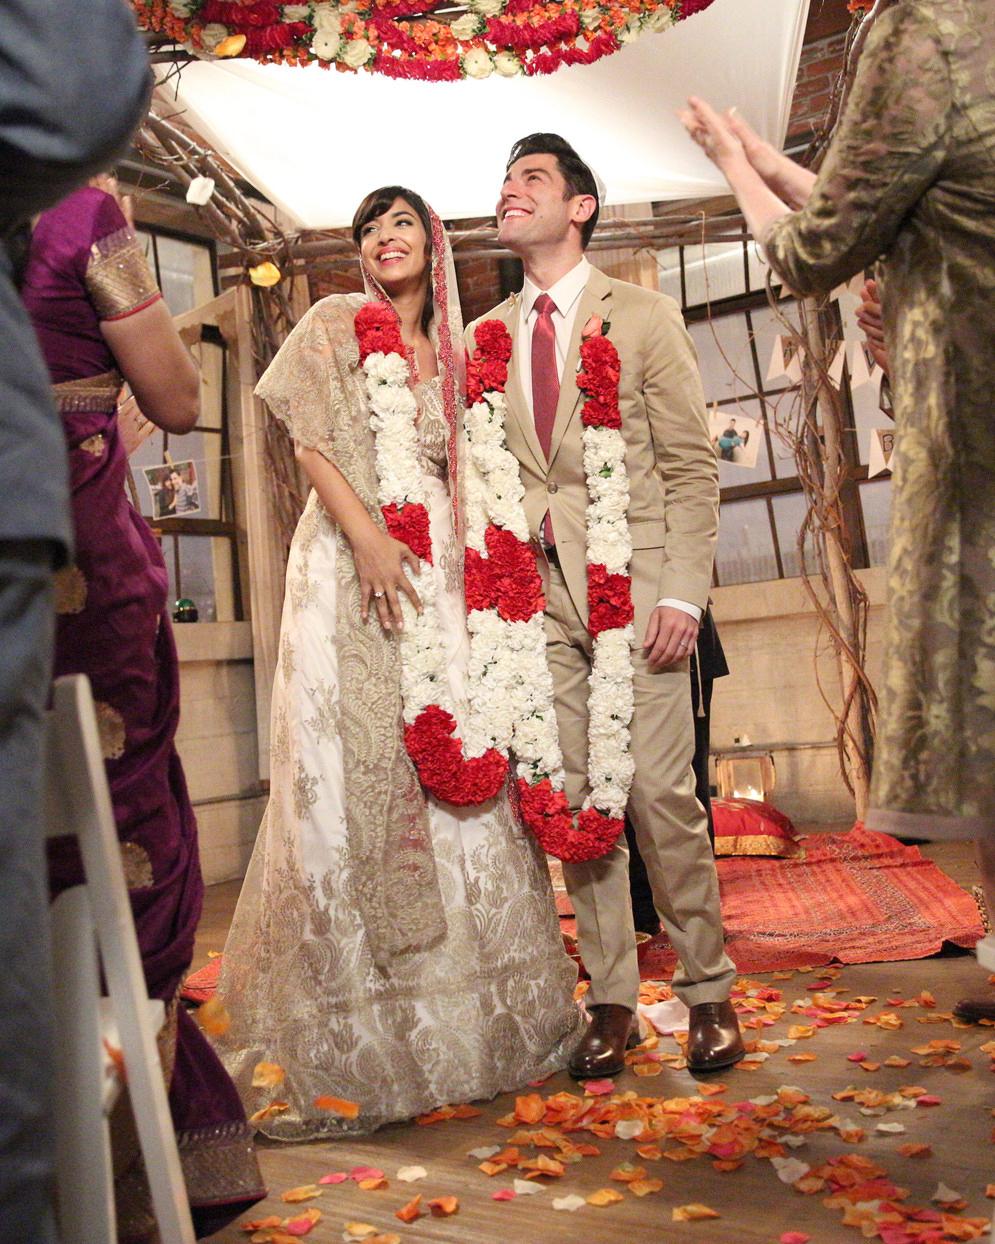 new-girl-wedding-4-0516.jpg